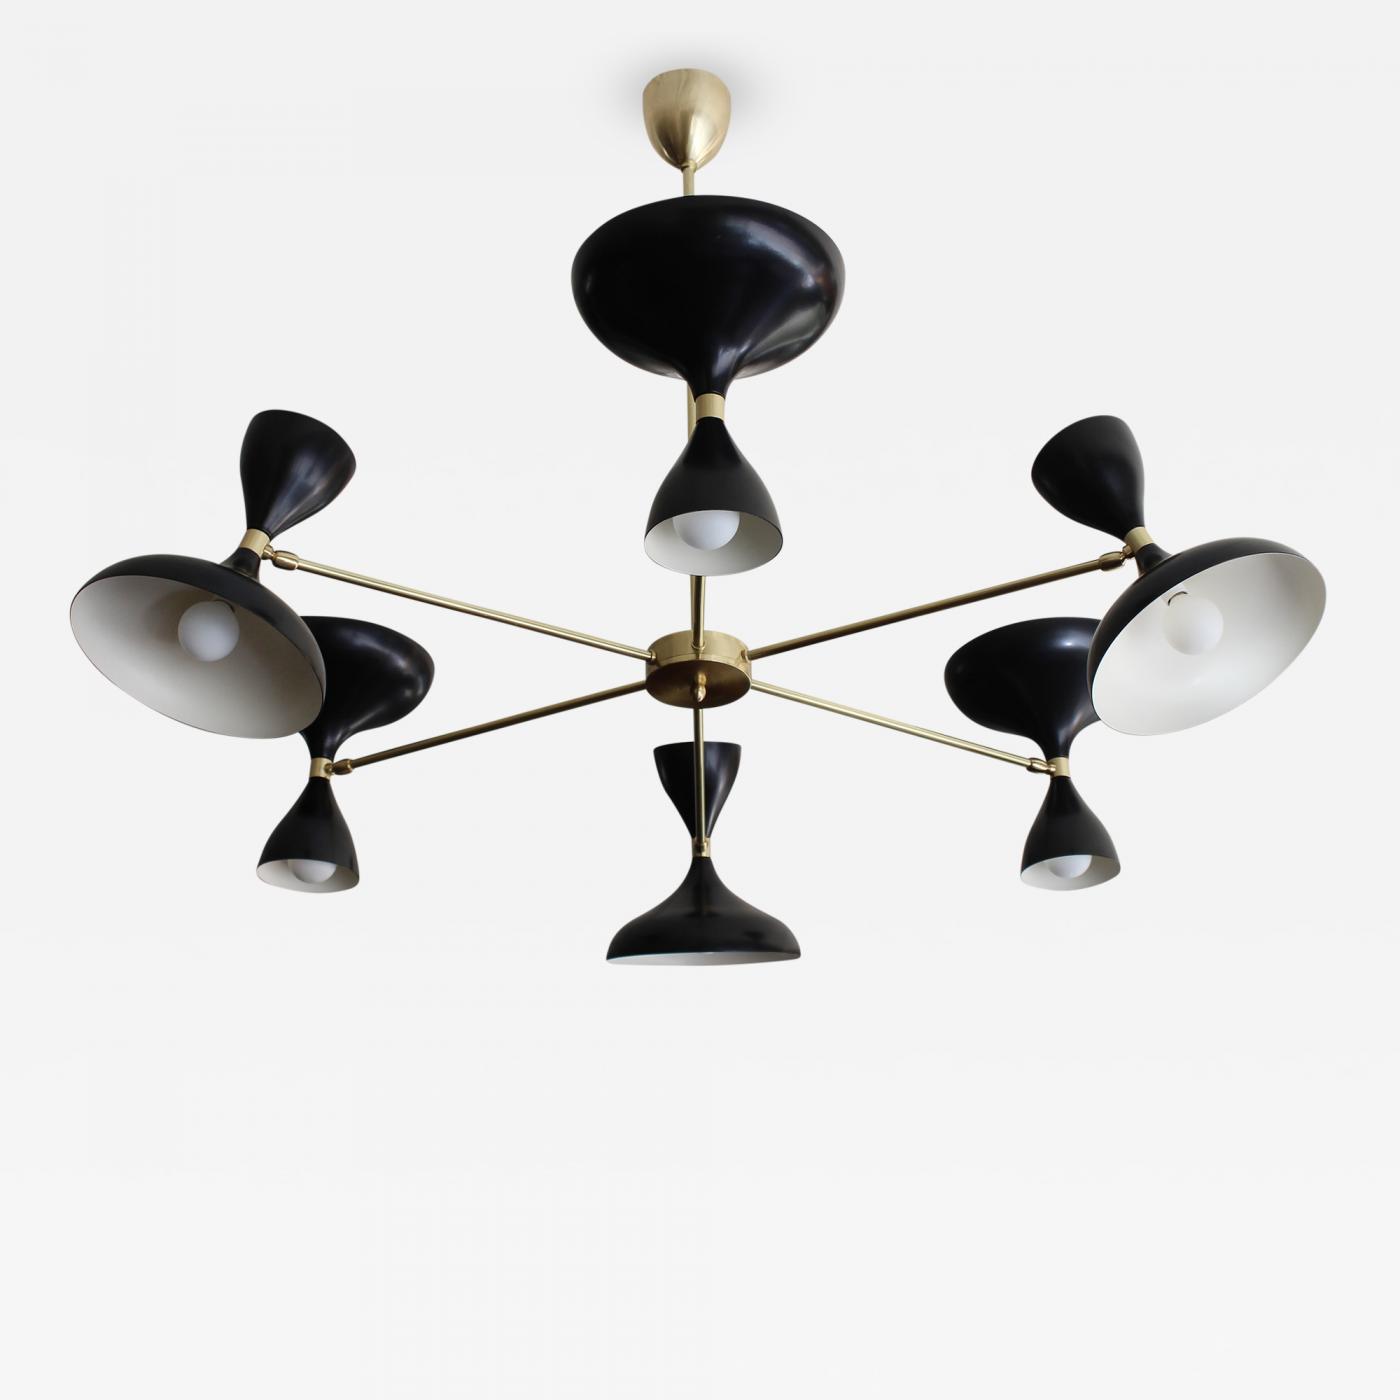 Union lighting pendants progress lighting penn collection light listings furniture lighting chandeliers and pendants with union lighting pendants mozeypictures Gallery